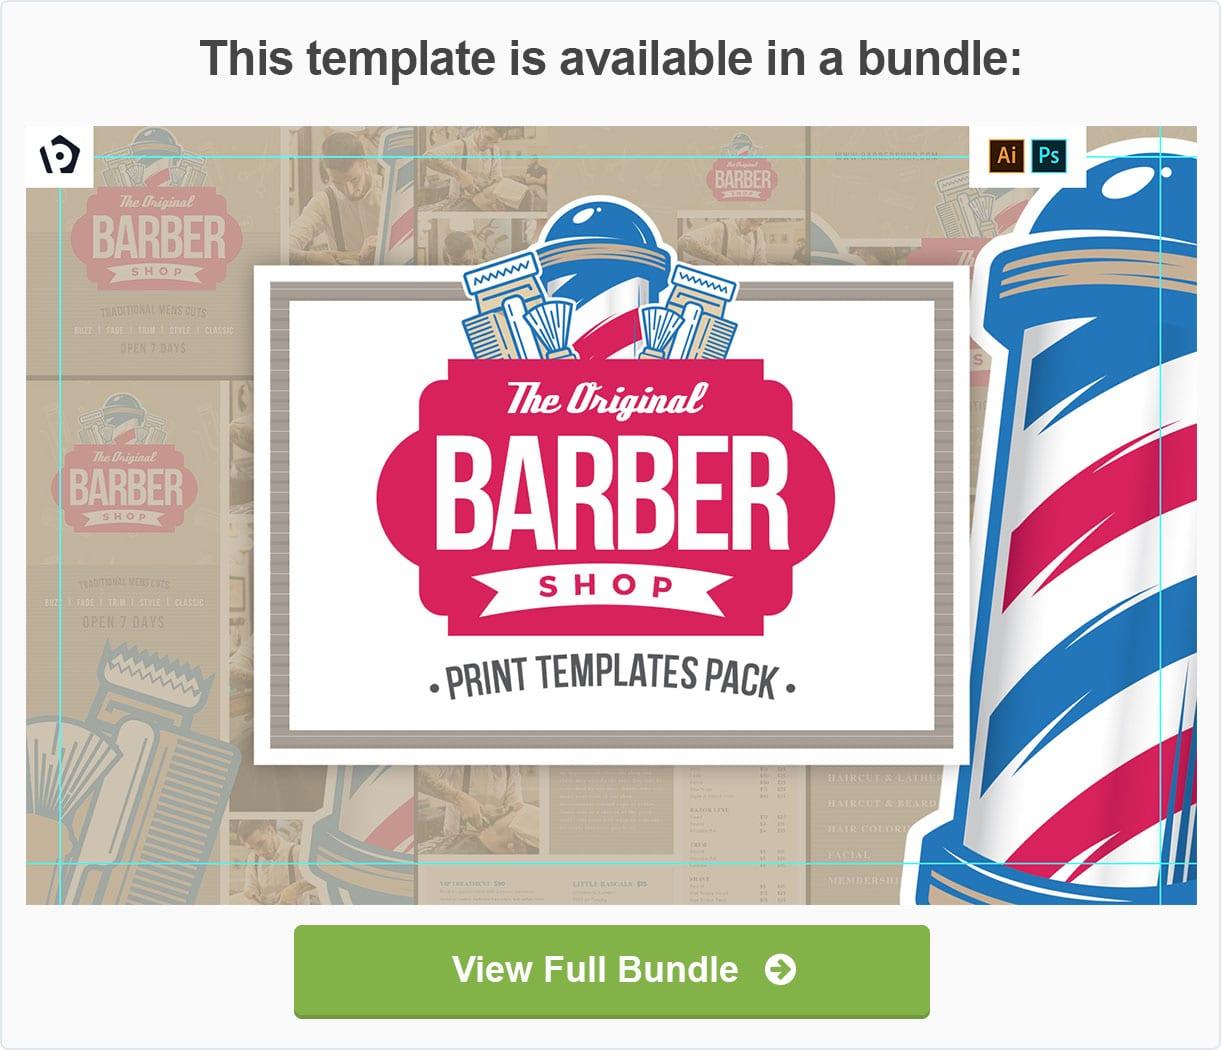 Barber Shop Templates Pack by BrandPacks